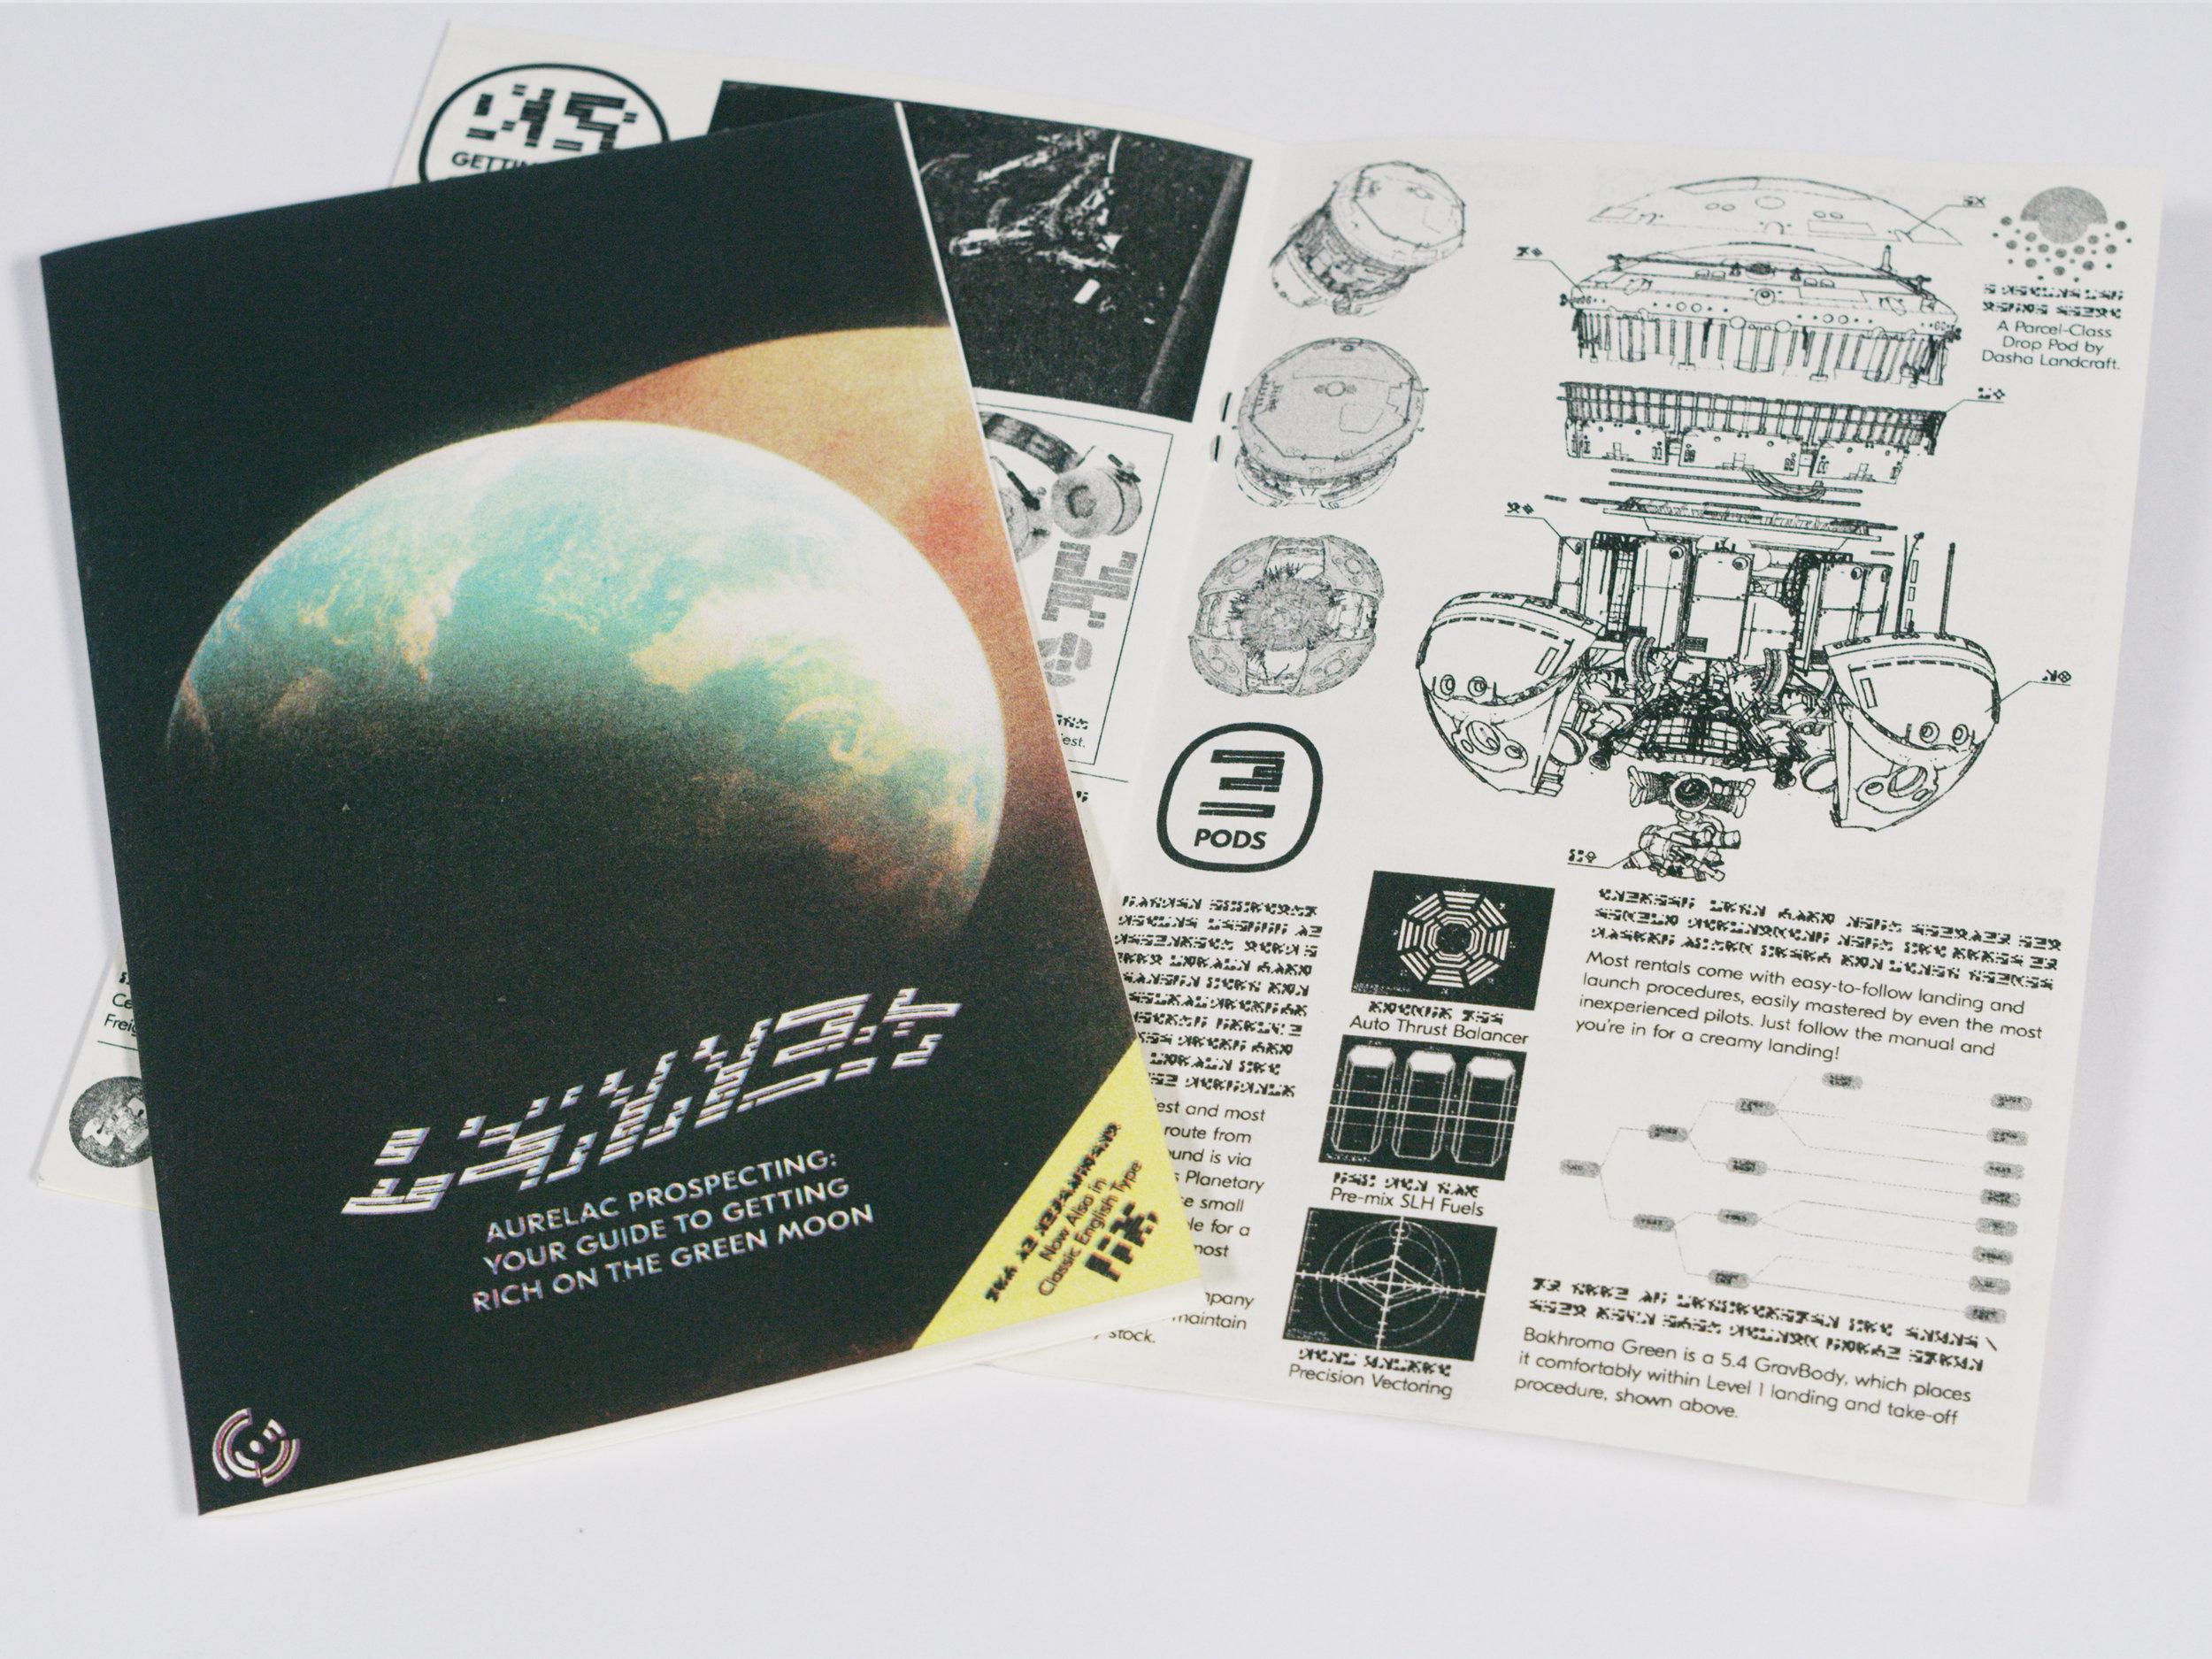 Green Moon Manual.jpg